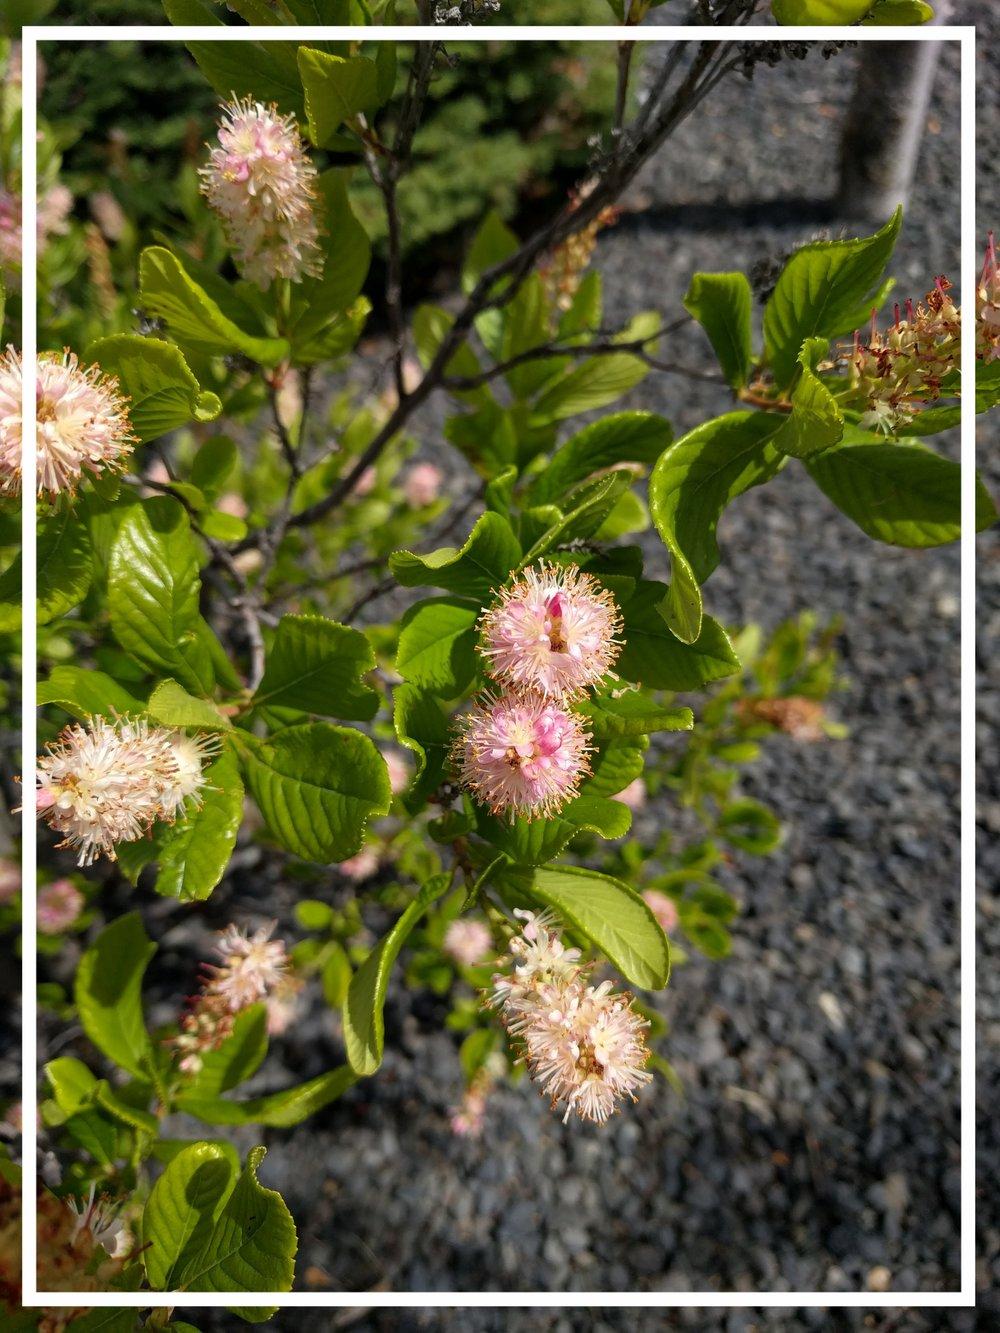 summersweet-clethra-alnifolia